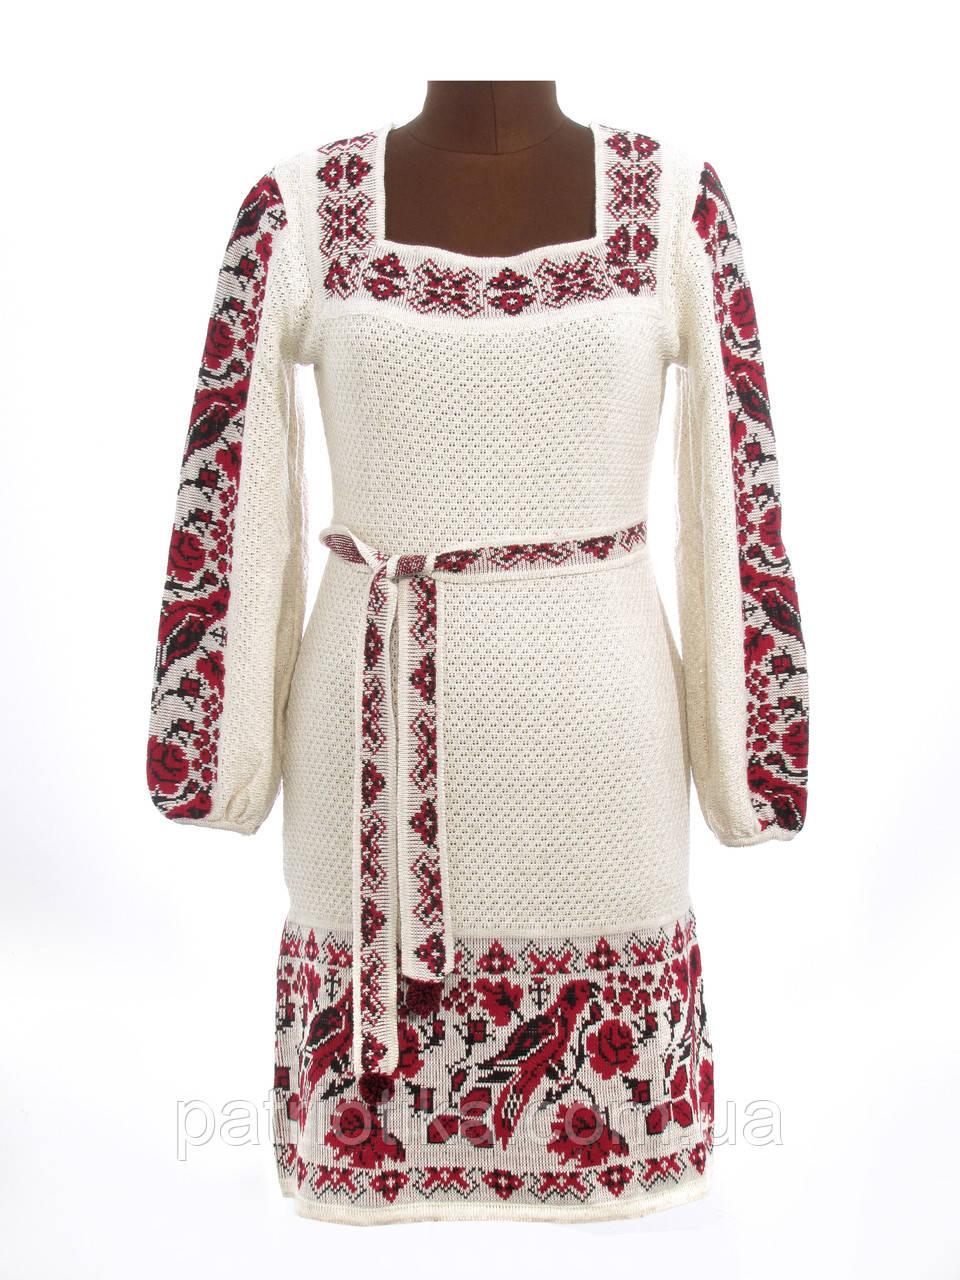 Платье-вышиванка вязаное Птички | Плаття-вишиванка вязане Пташки